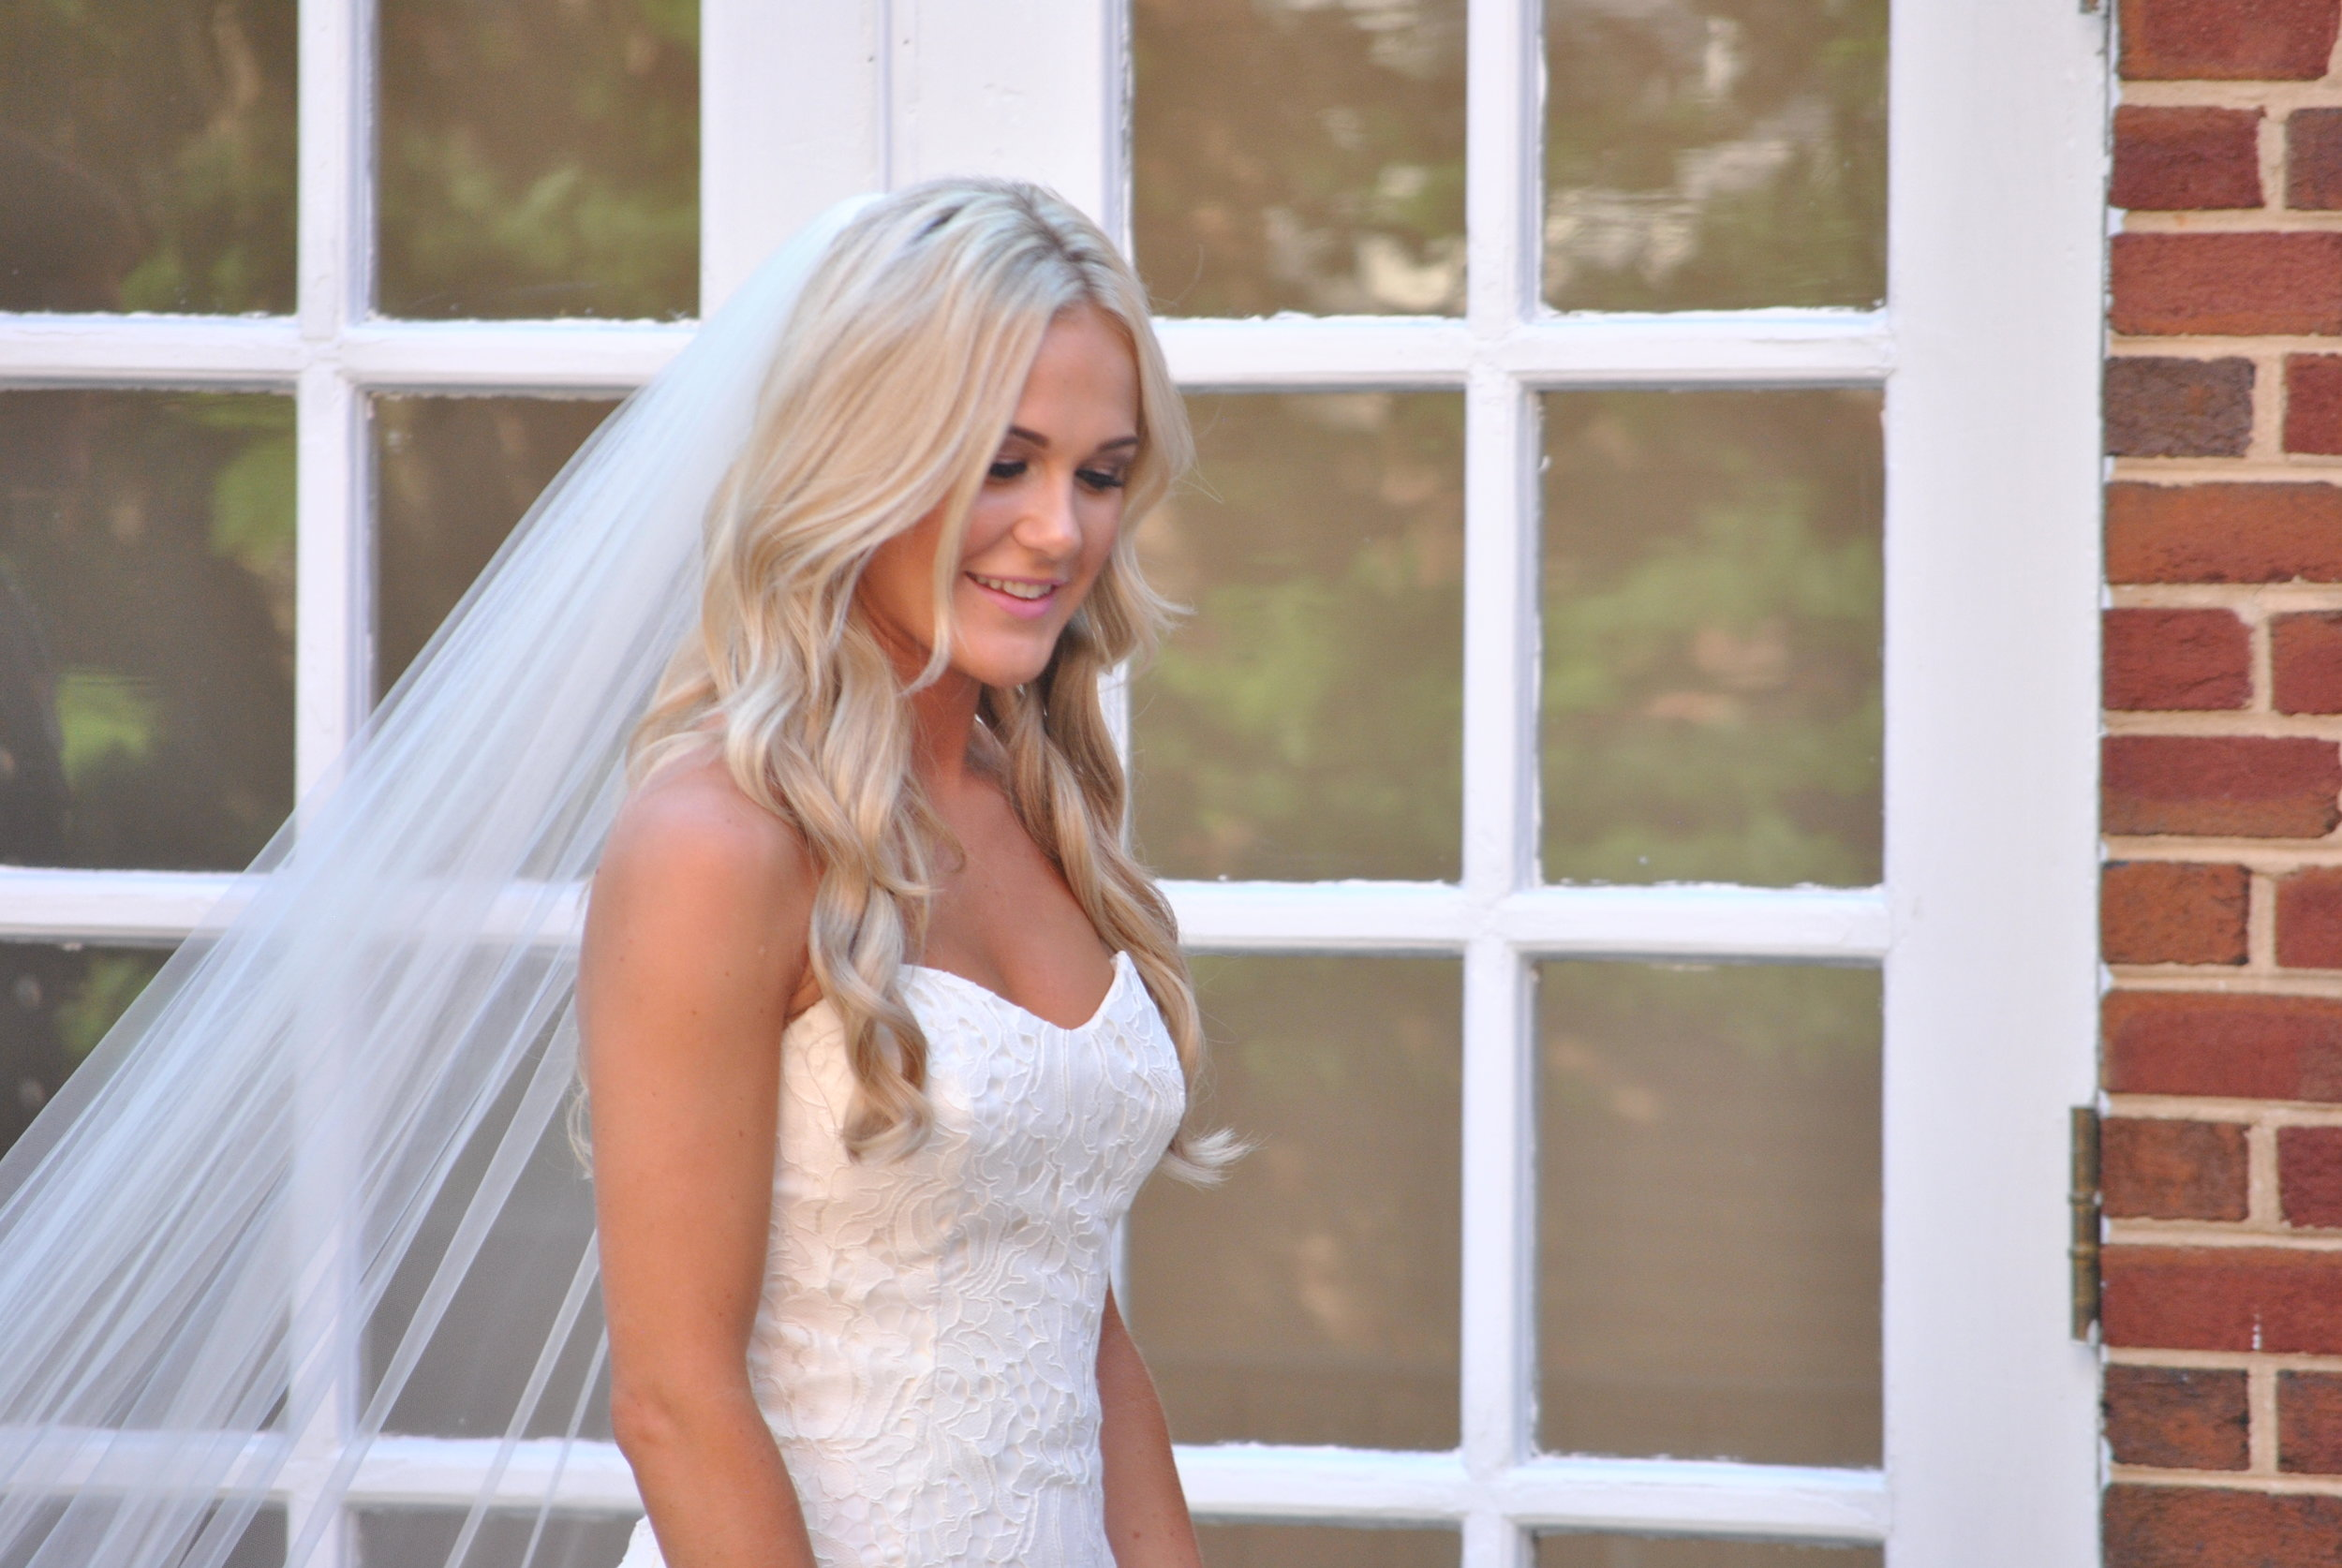 Sarah in her wedding dress